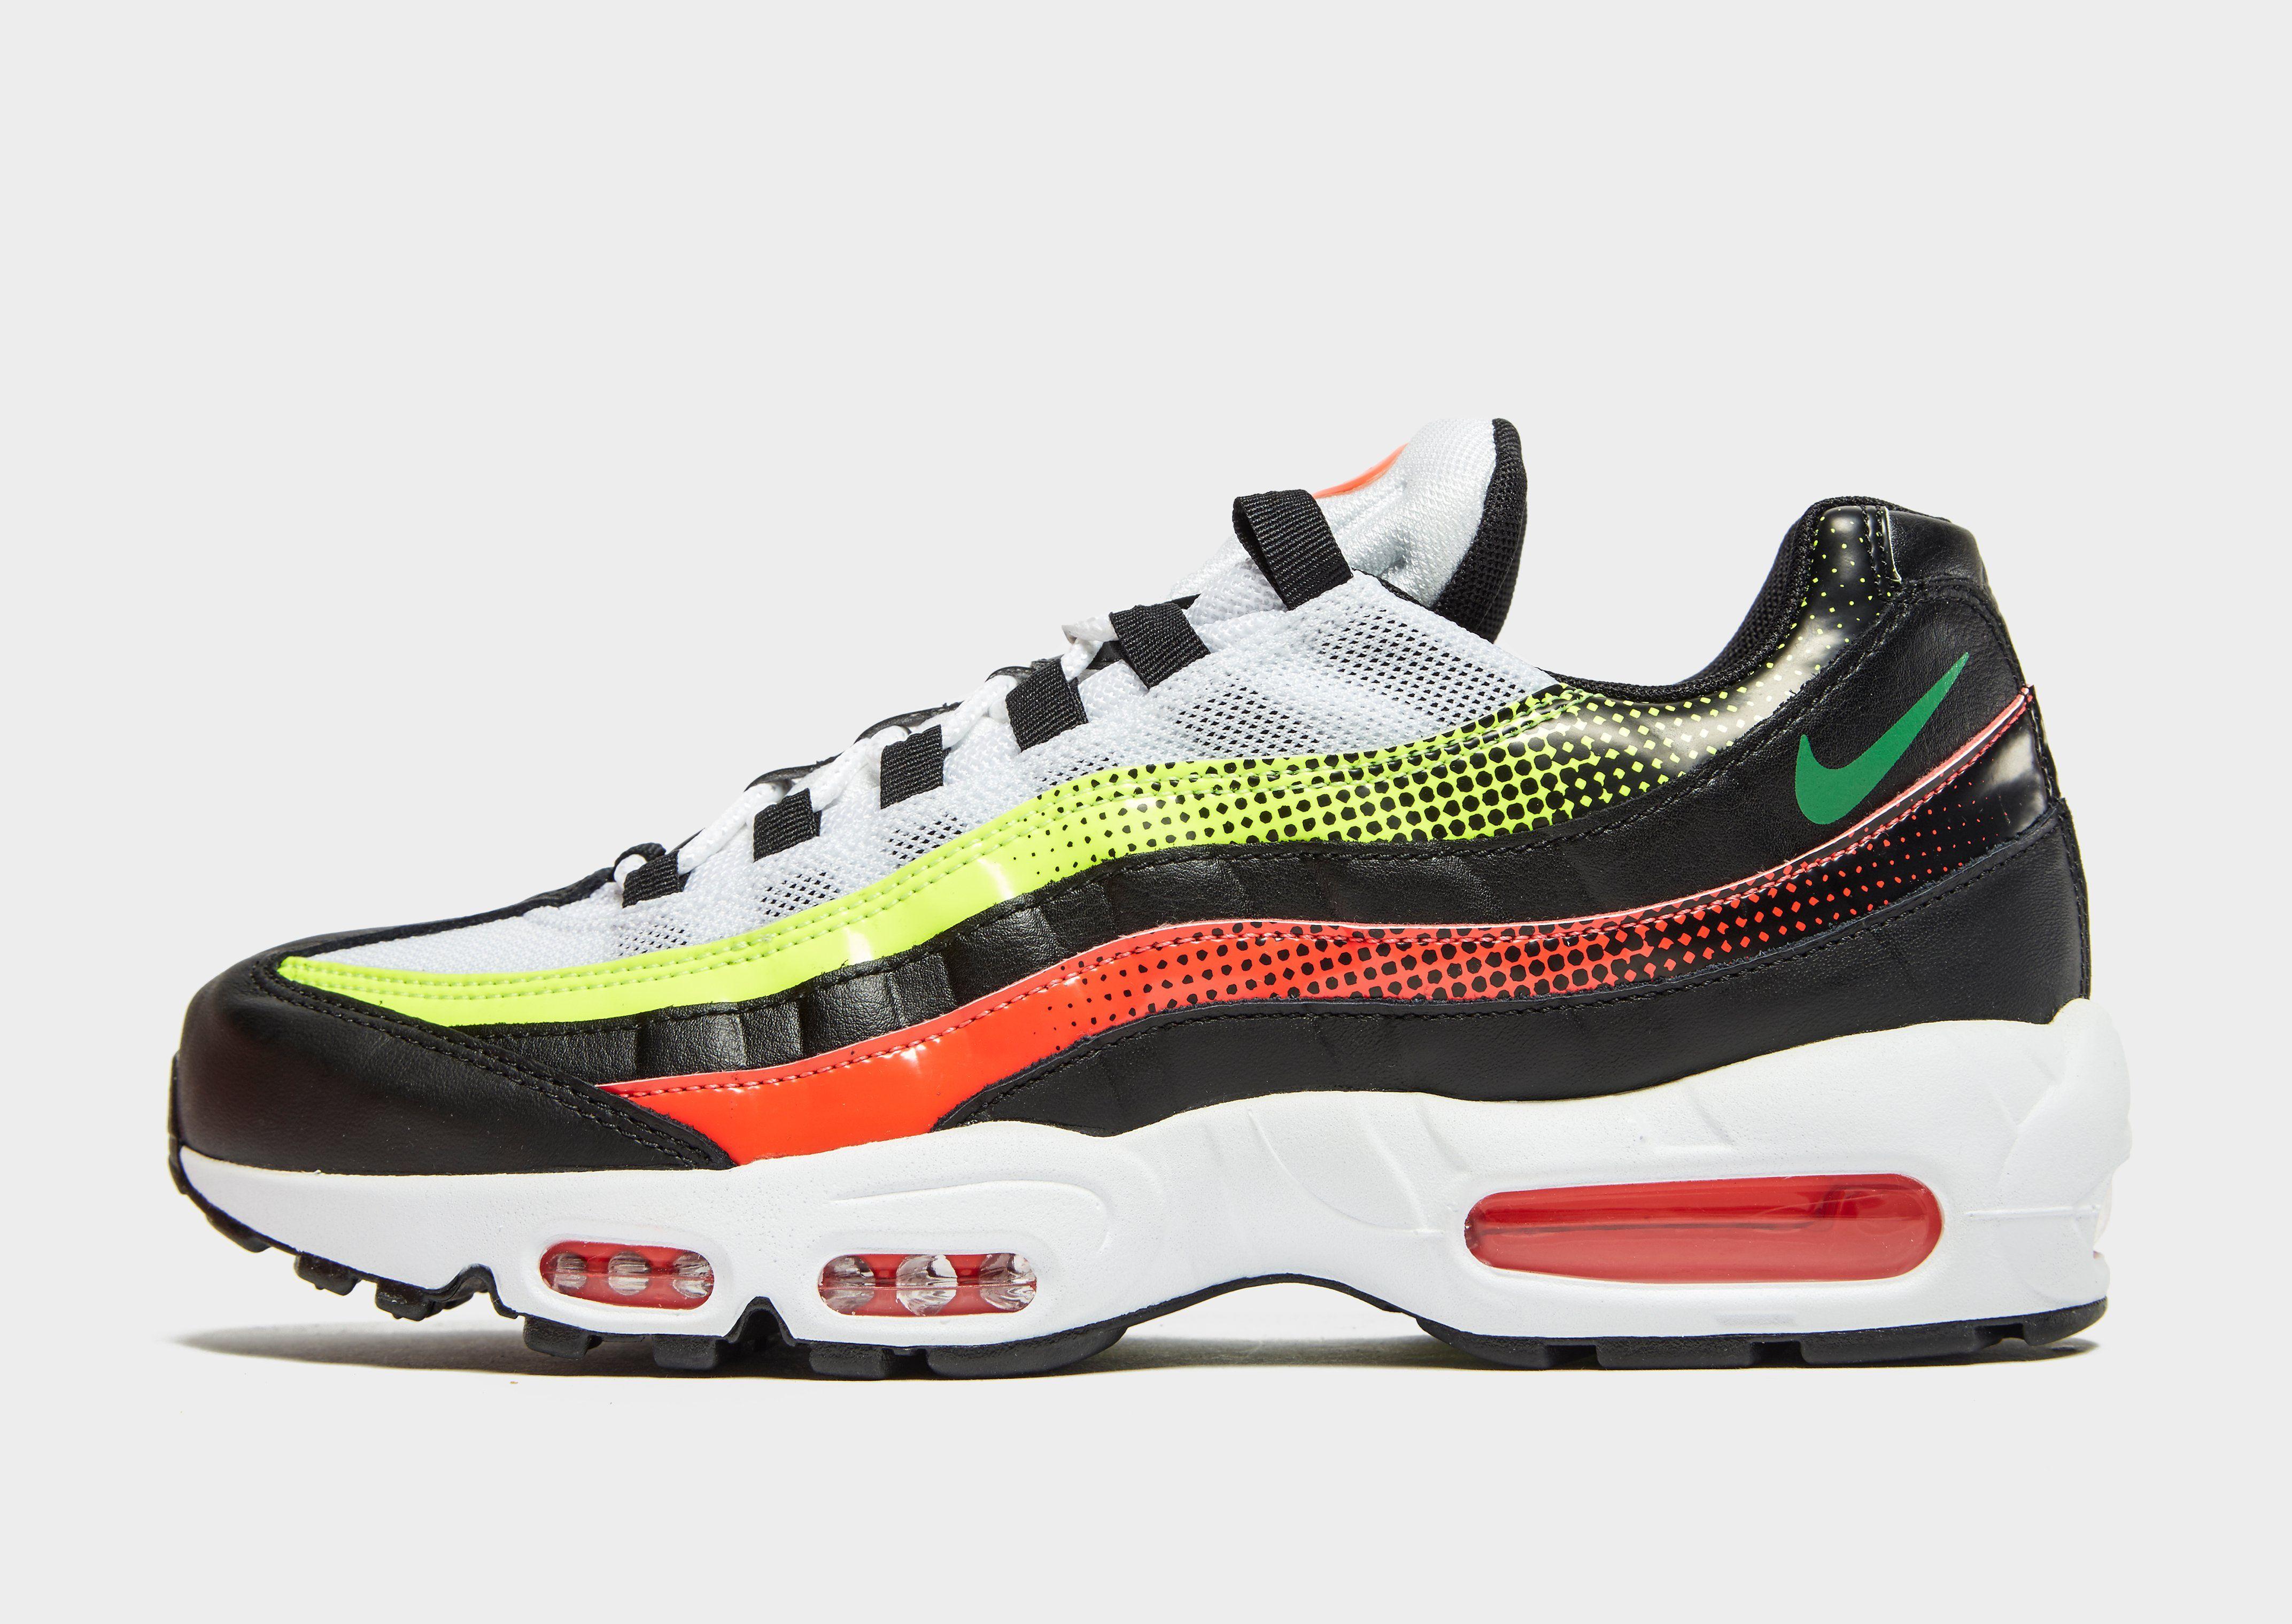 00e05da0 Nike Air Max 95 SE   JD Sports Ireland